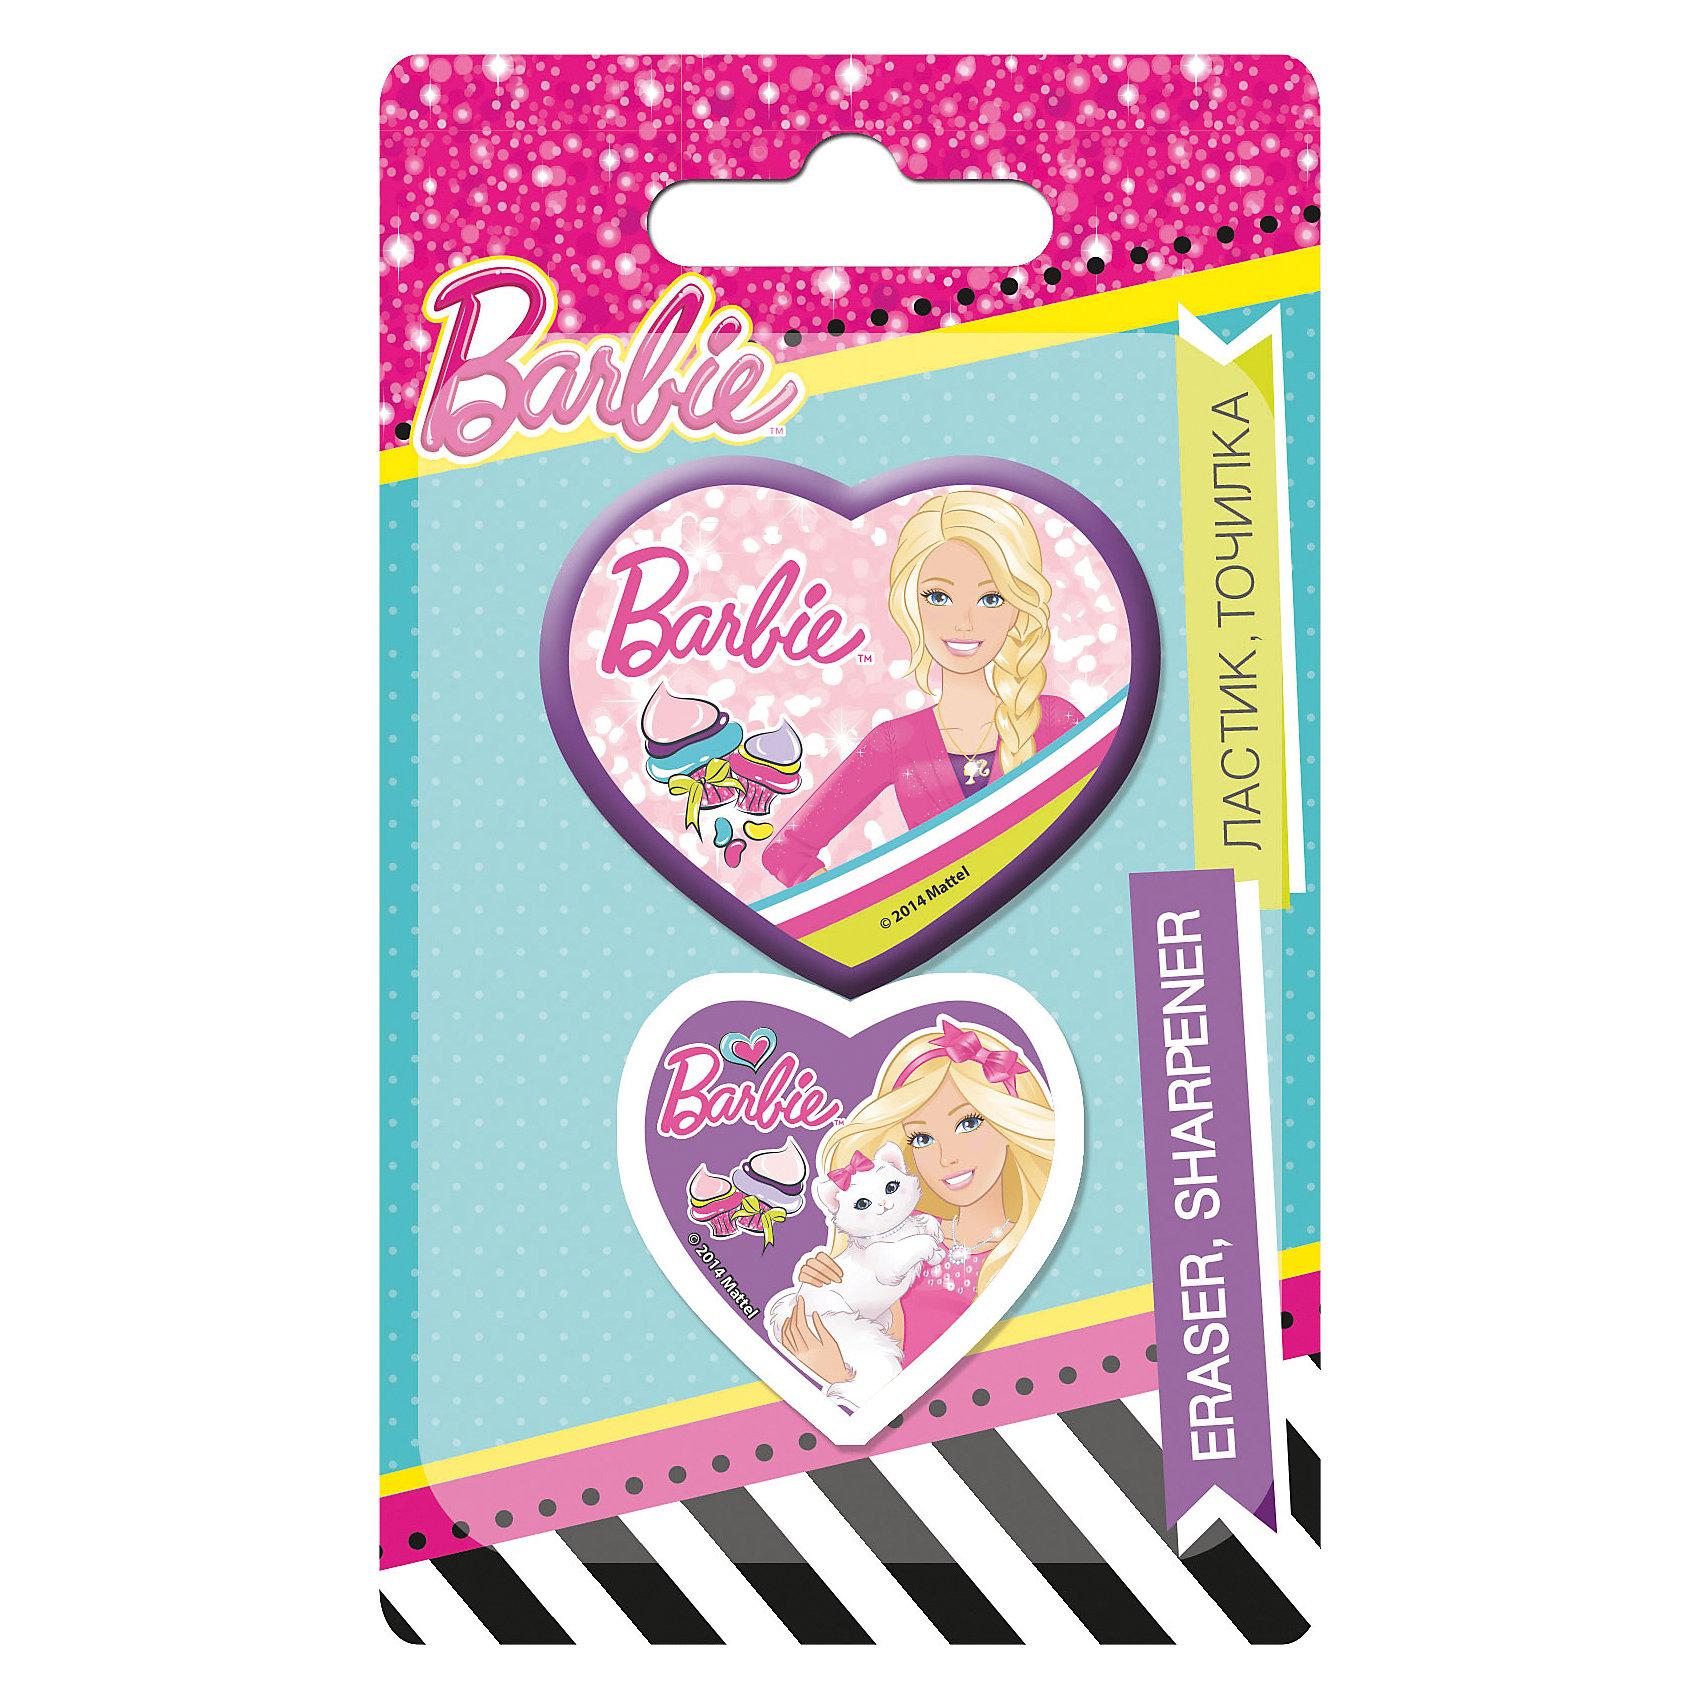 Академия групп Канцелярский набор (точилка, ластик), Barbie академия групп канцелярский набор точилка ластик barbie